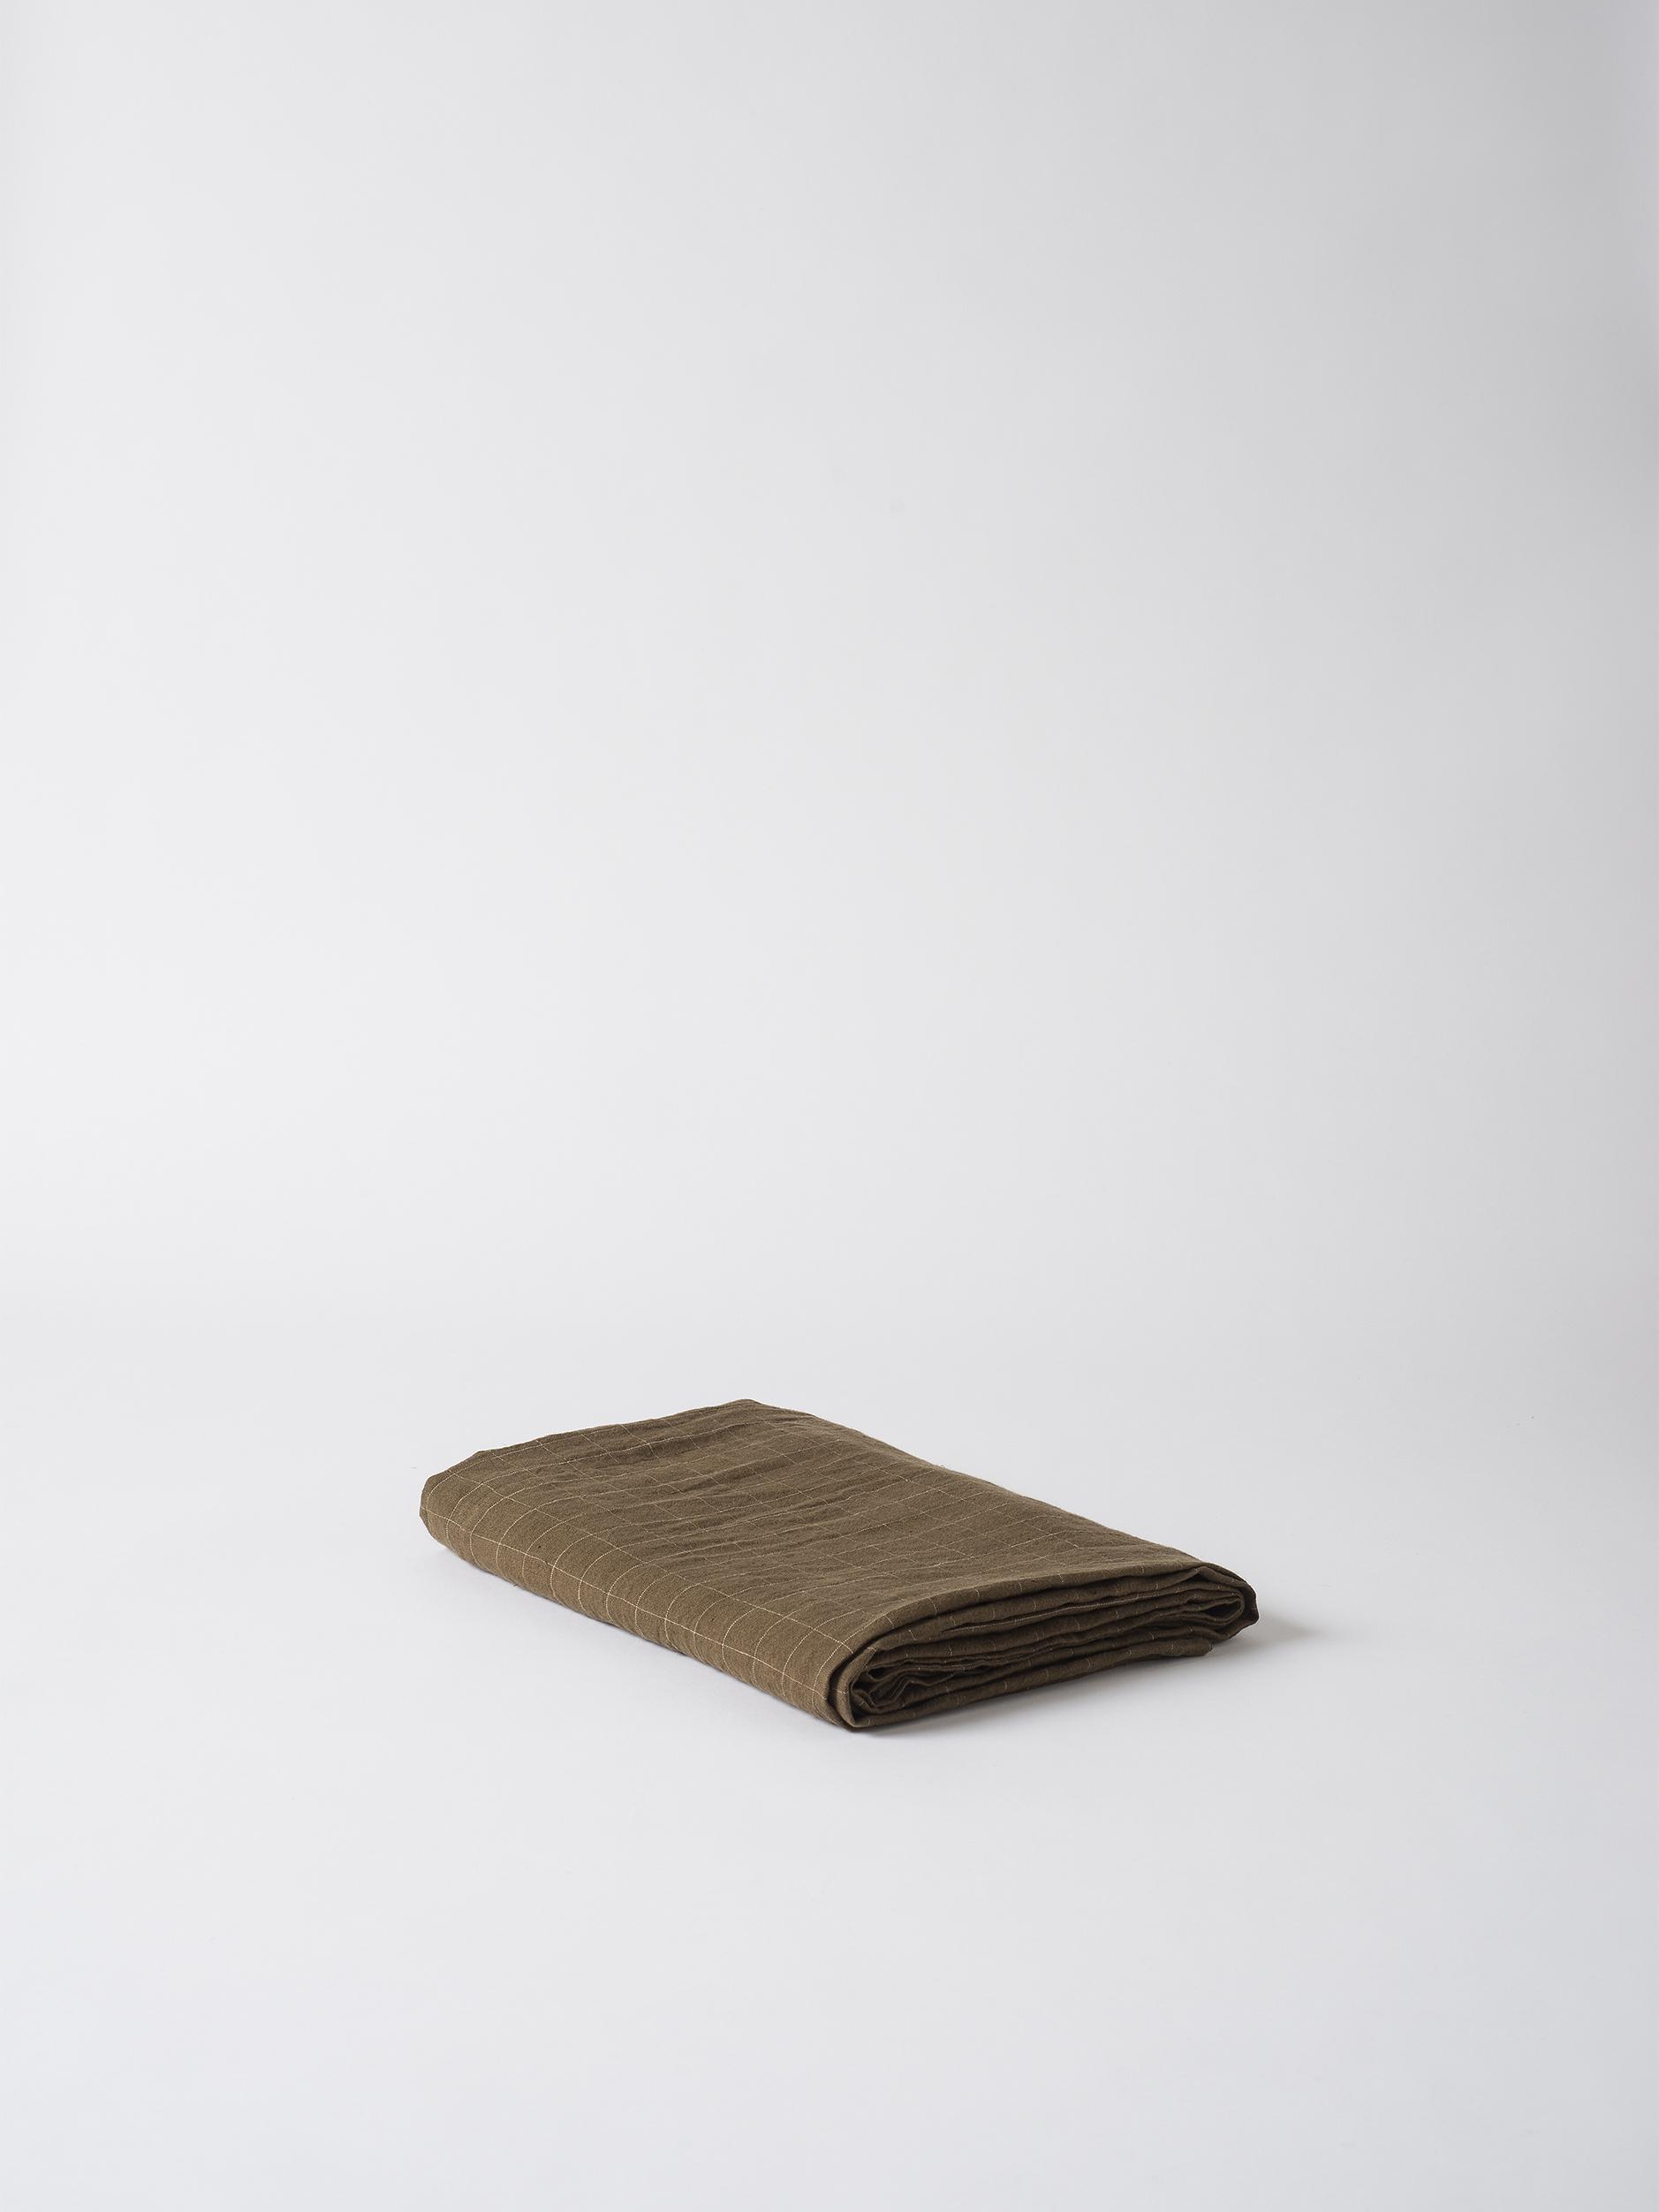 Dine Grid Linen Tablecloth $159.00